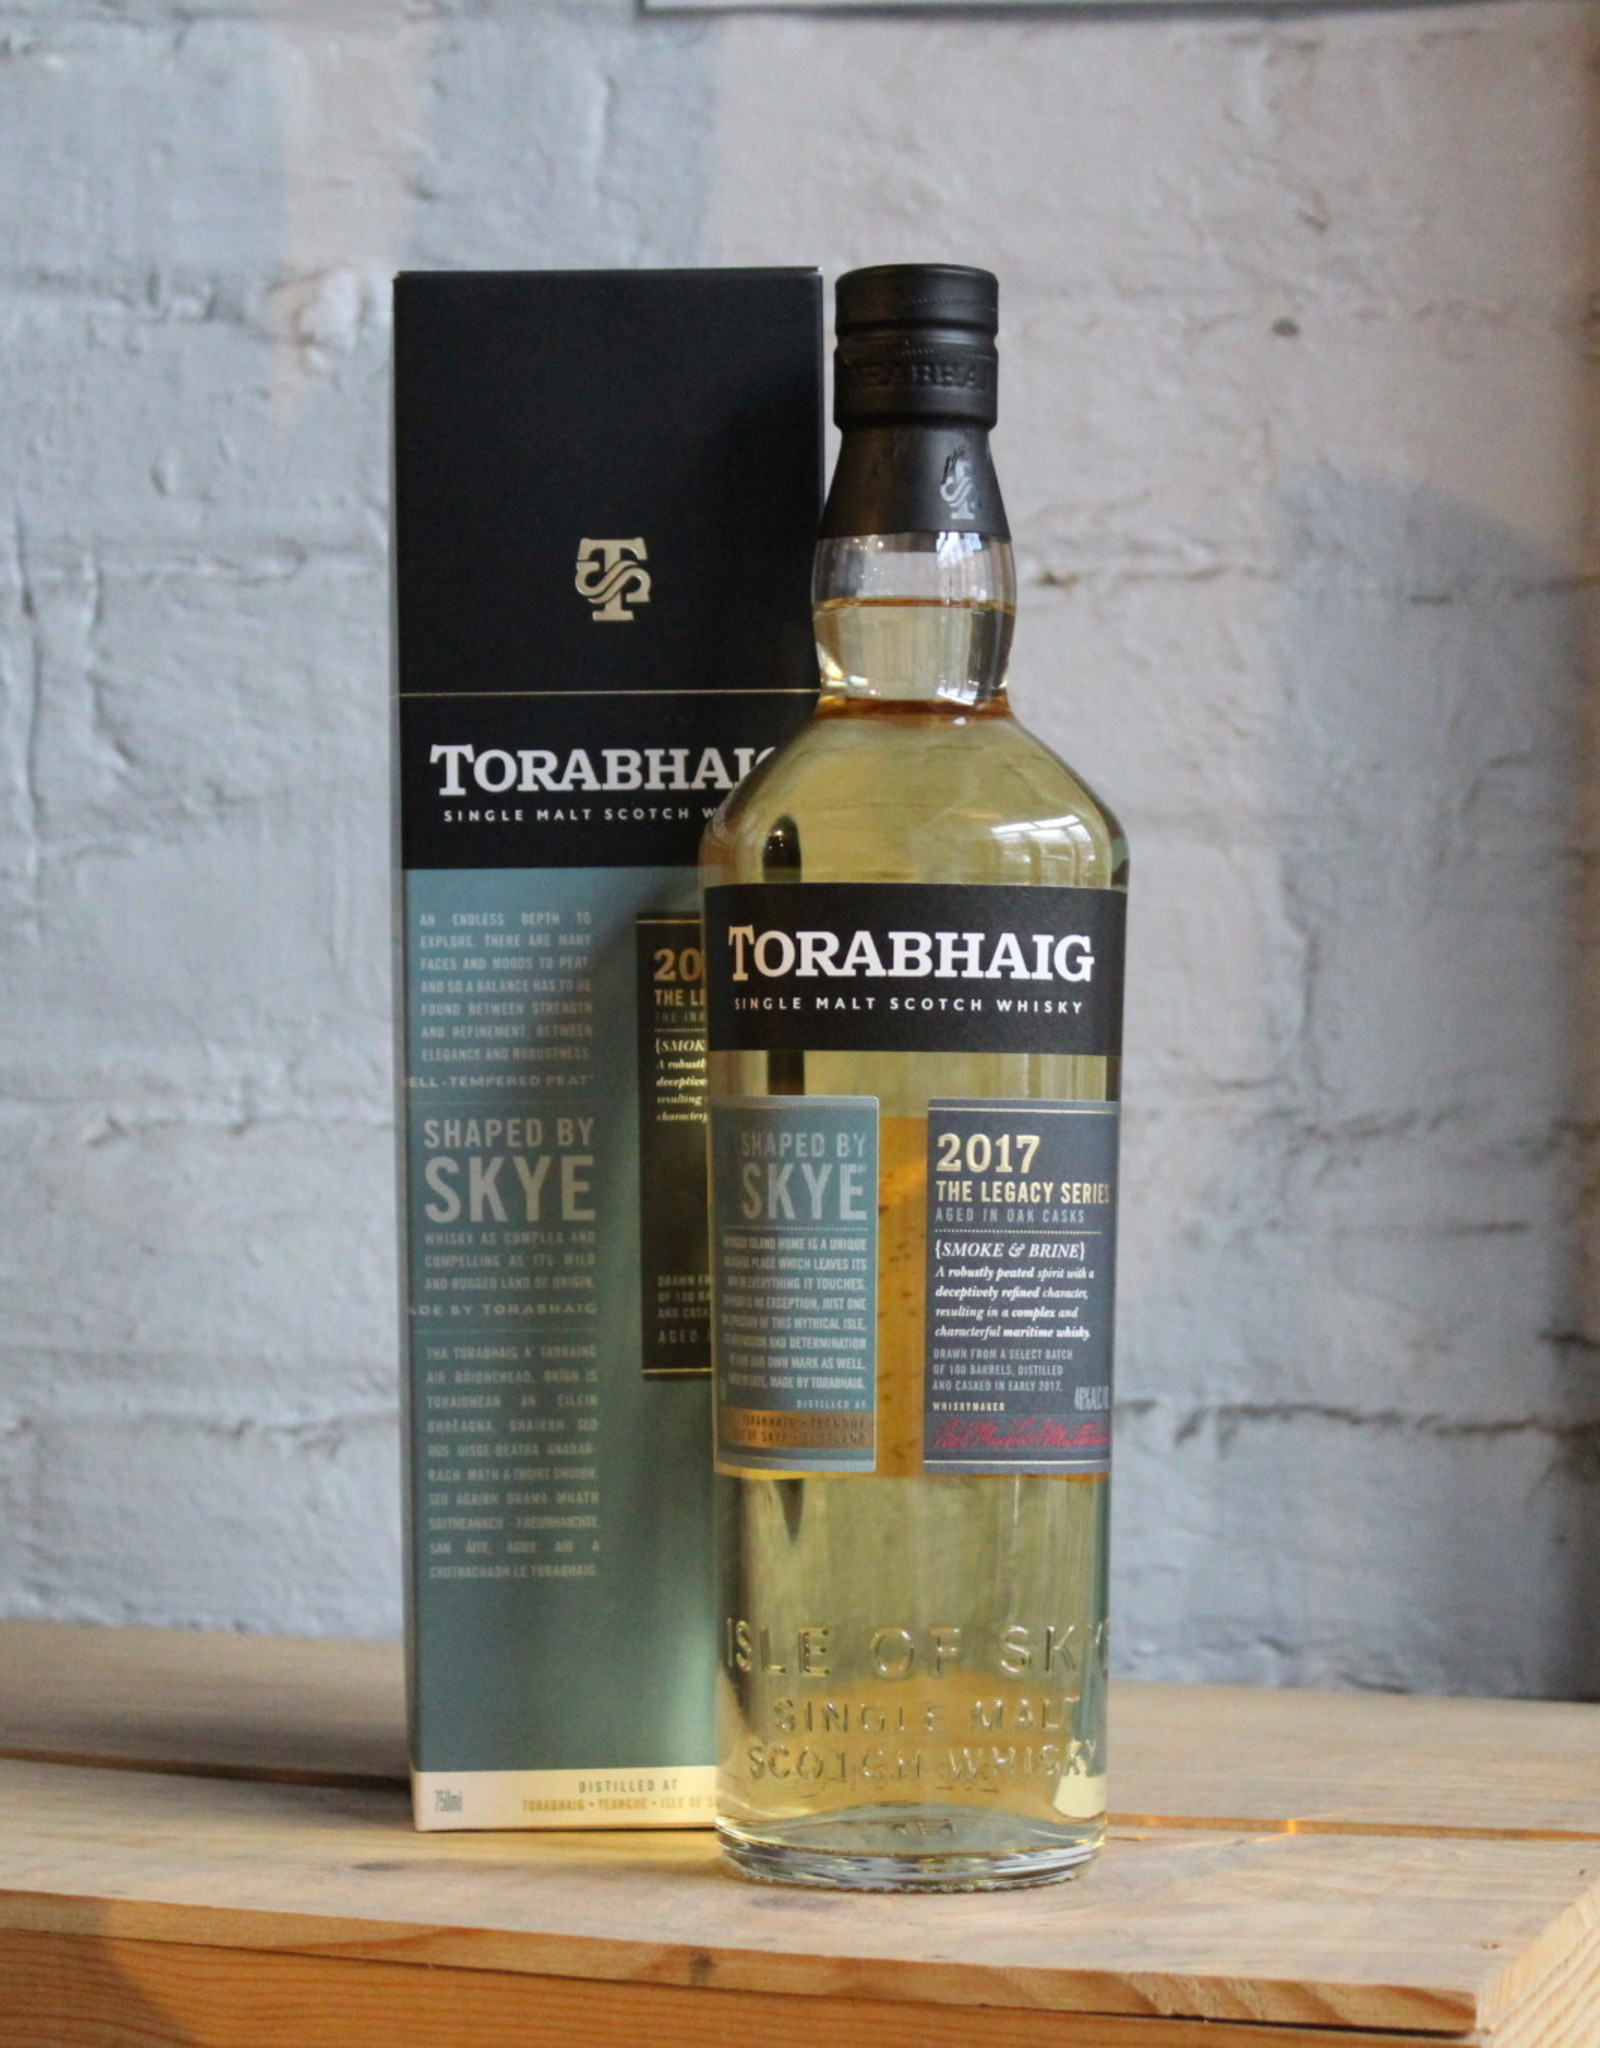 Torabhaig The Legacy Series - Skye, Scotland (750ml)